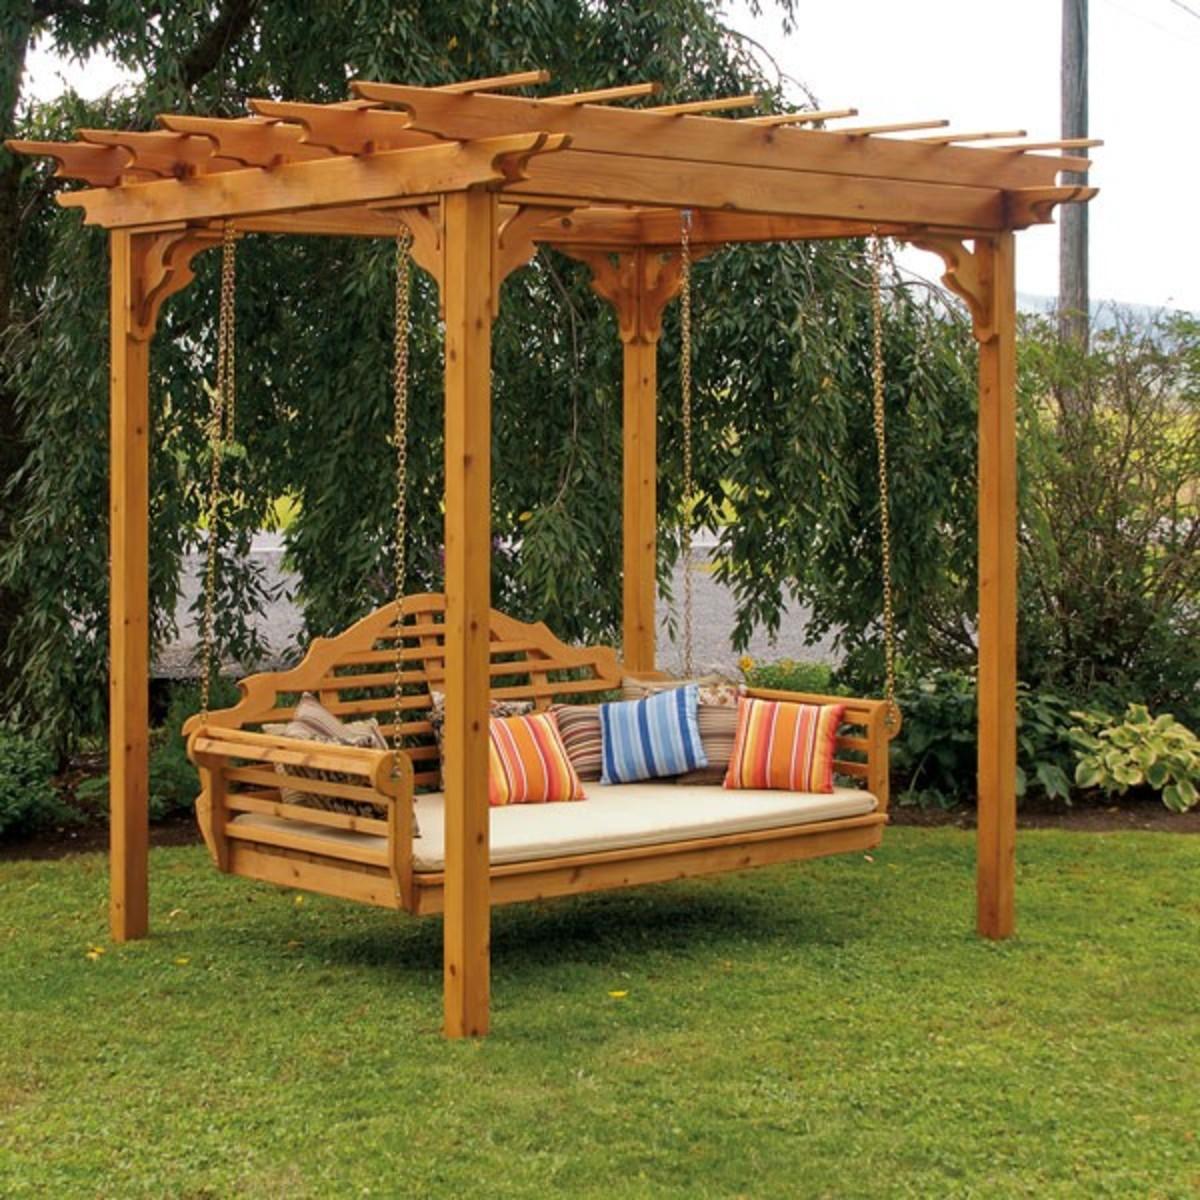 a functional cedar pergola with a swing